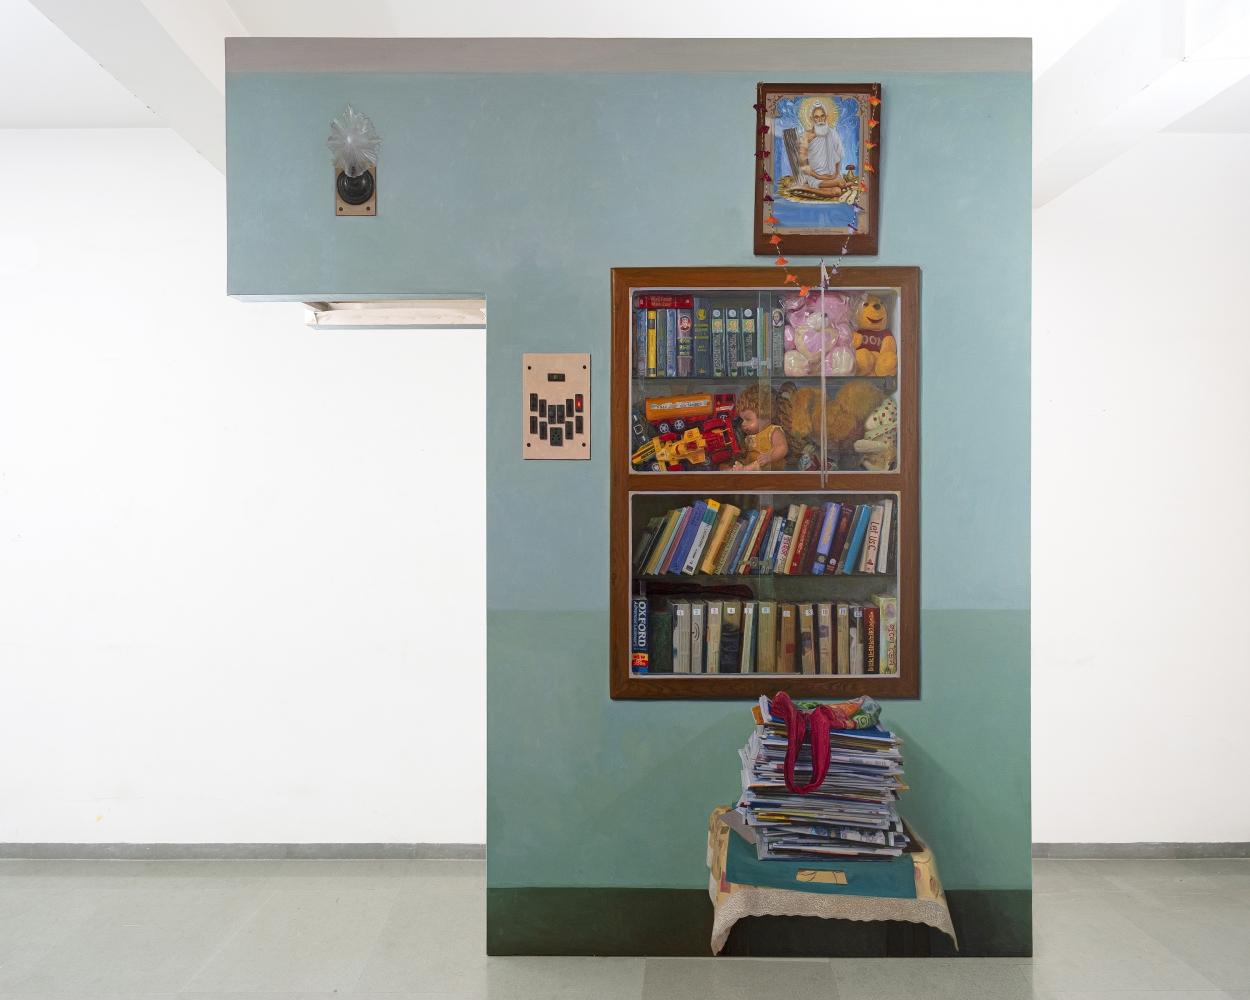 ABIR KARMAKAR Passage 2, 2020 Oil on canvas 108 x 100 in / 274.3 x 254 cm  (Part 2 of Set 1)